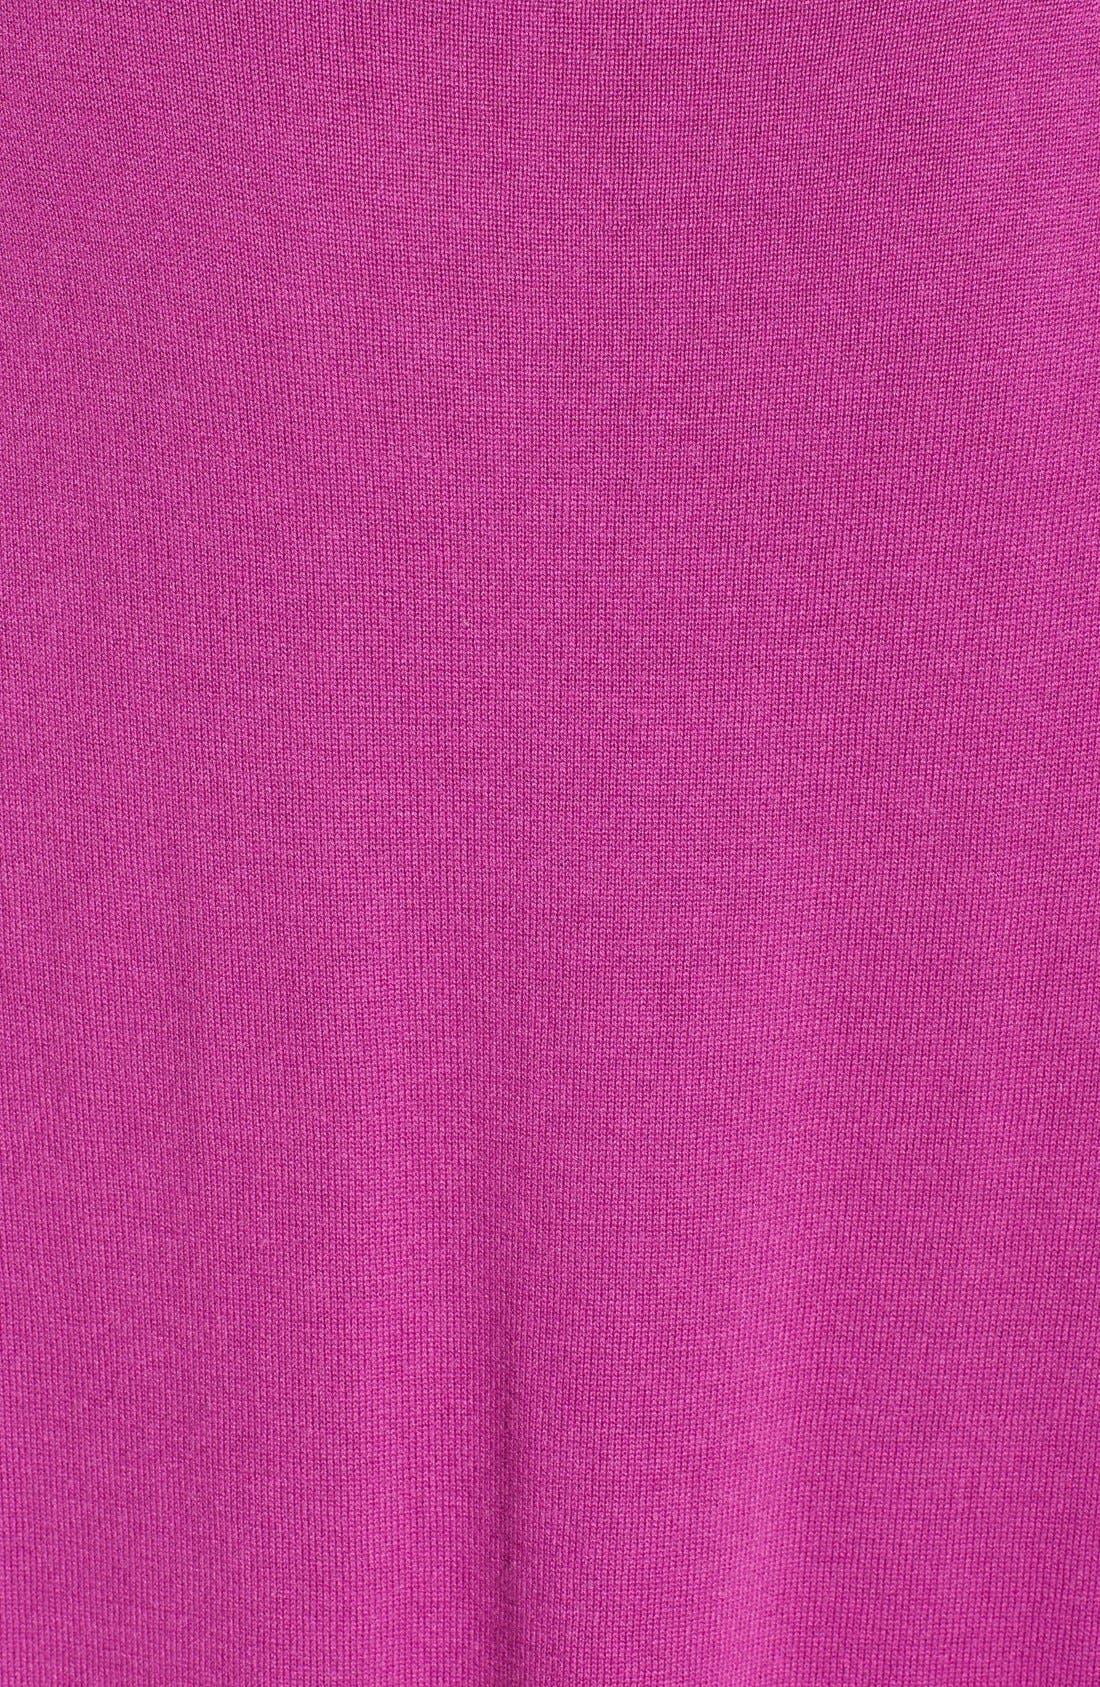 Raglan Crewneck Sweater,                             Alternate thumbnail 2, color,                             510